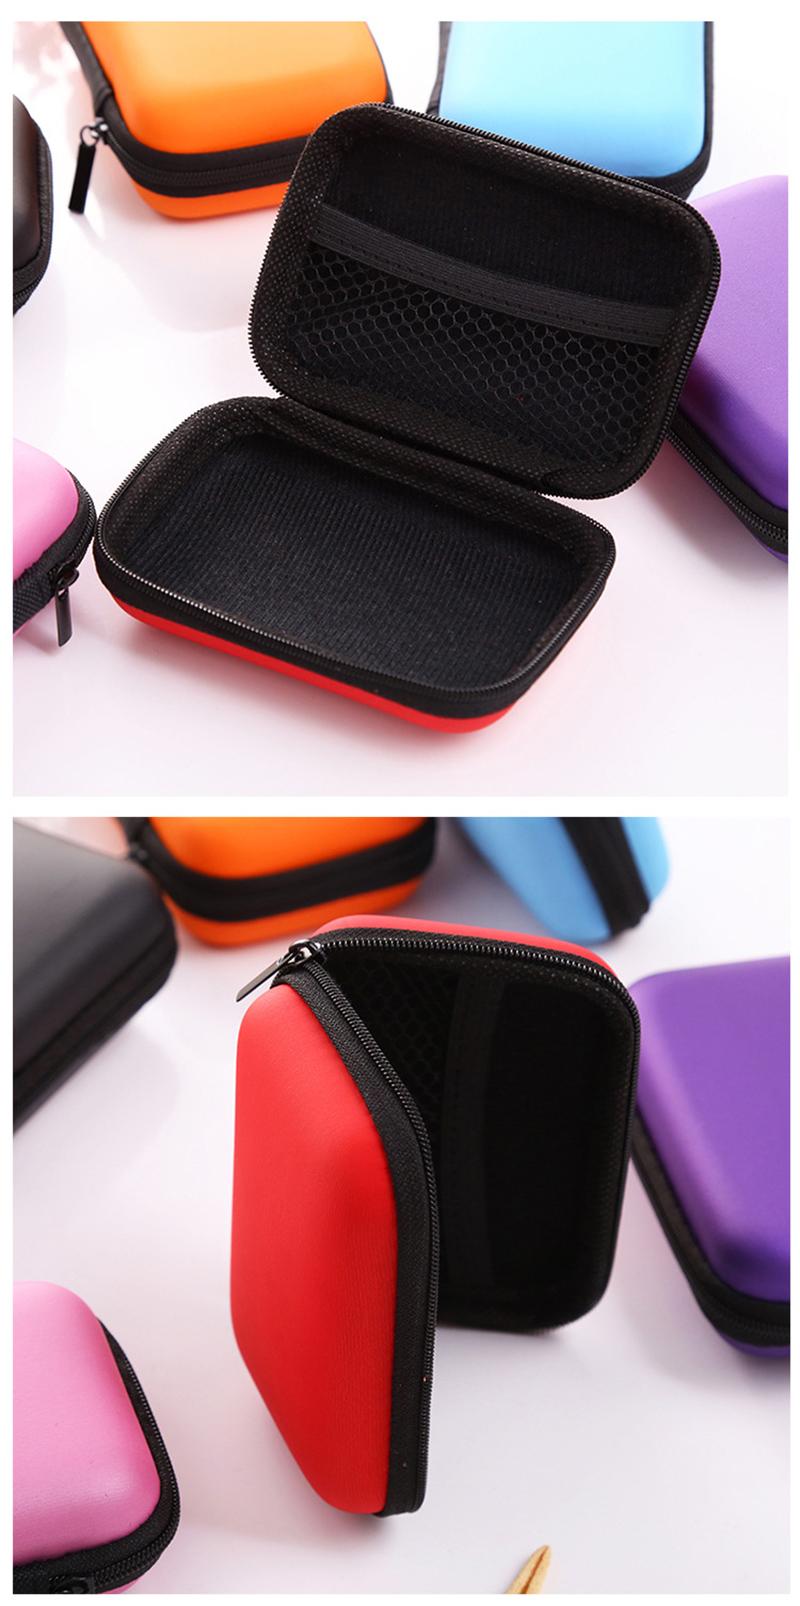 prativerdi Zippered Lock Hard Earphone Case EVA Leather Headphone Storage Bag Protective Usb Cable Portable travel Organizer3